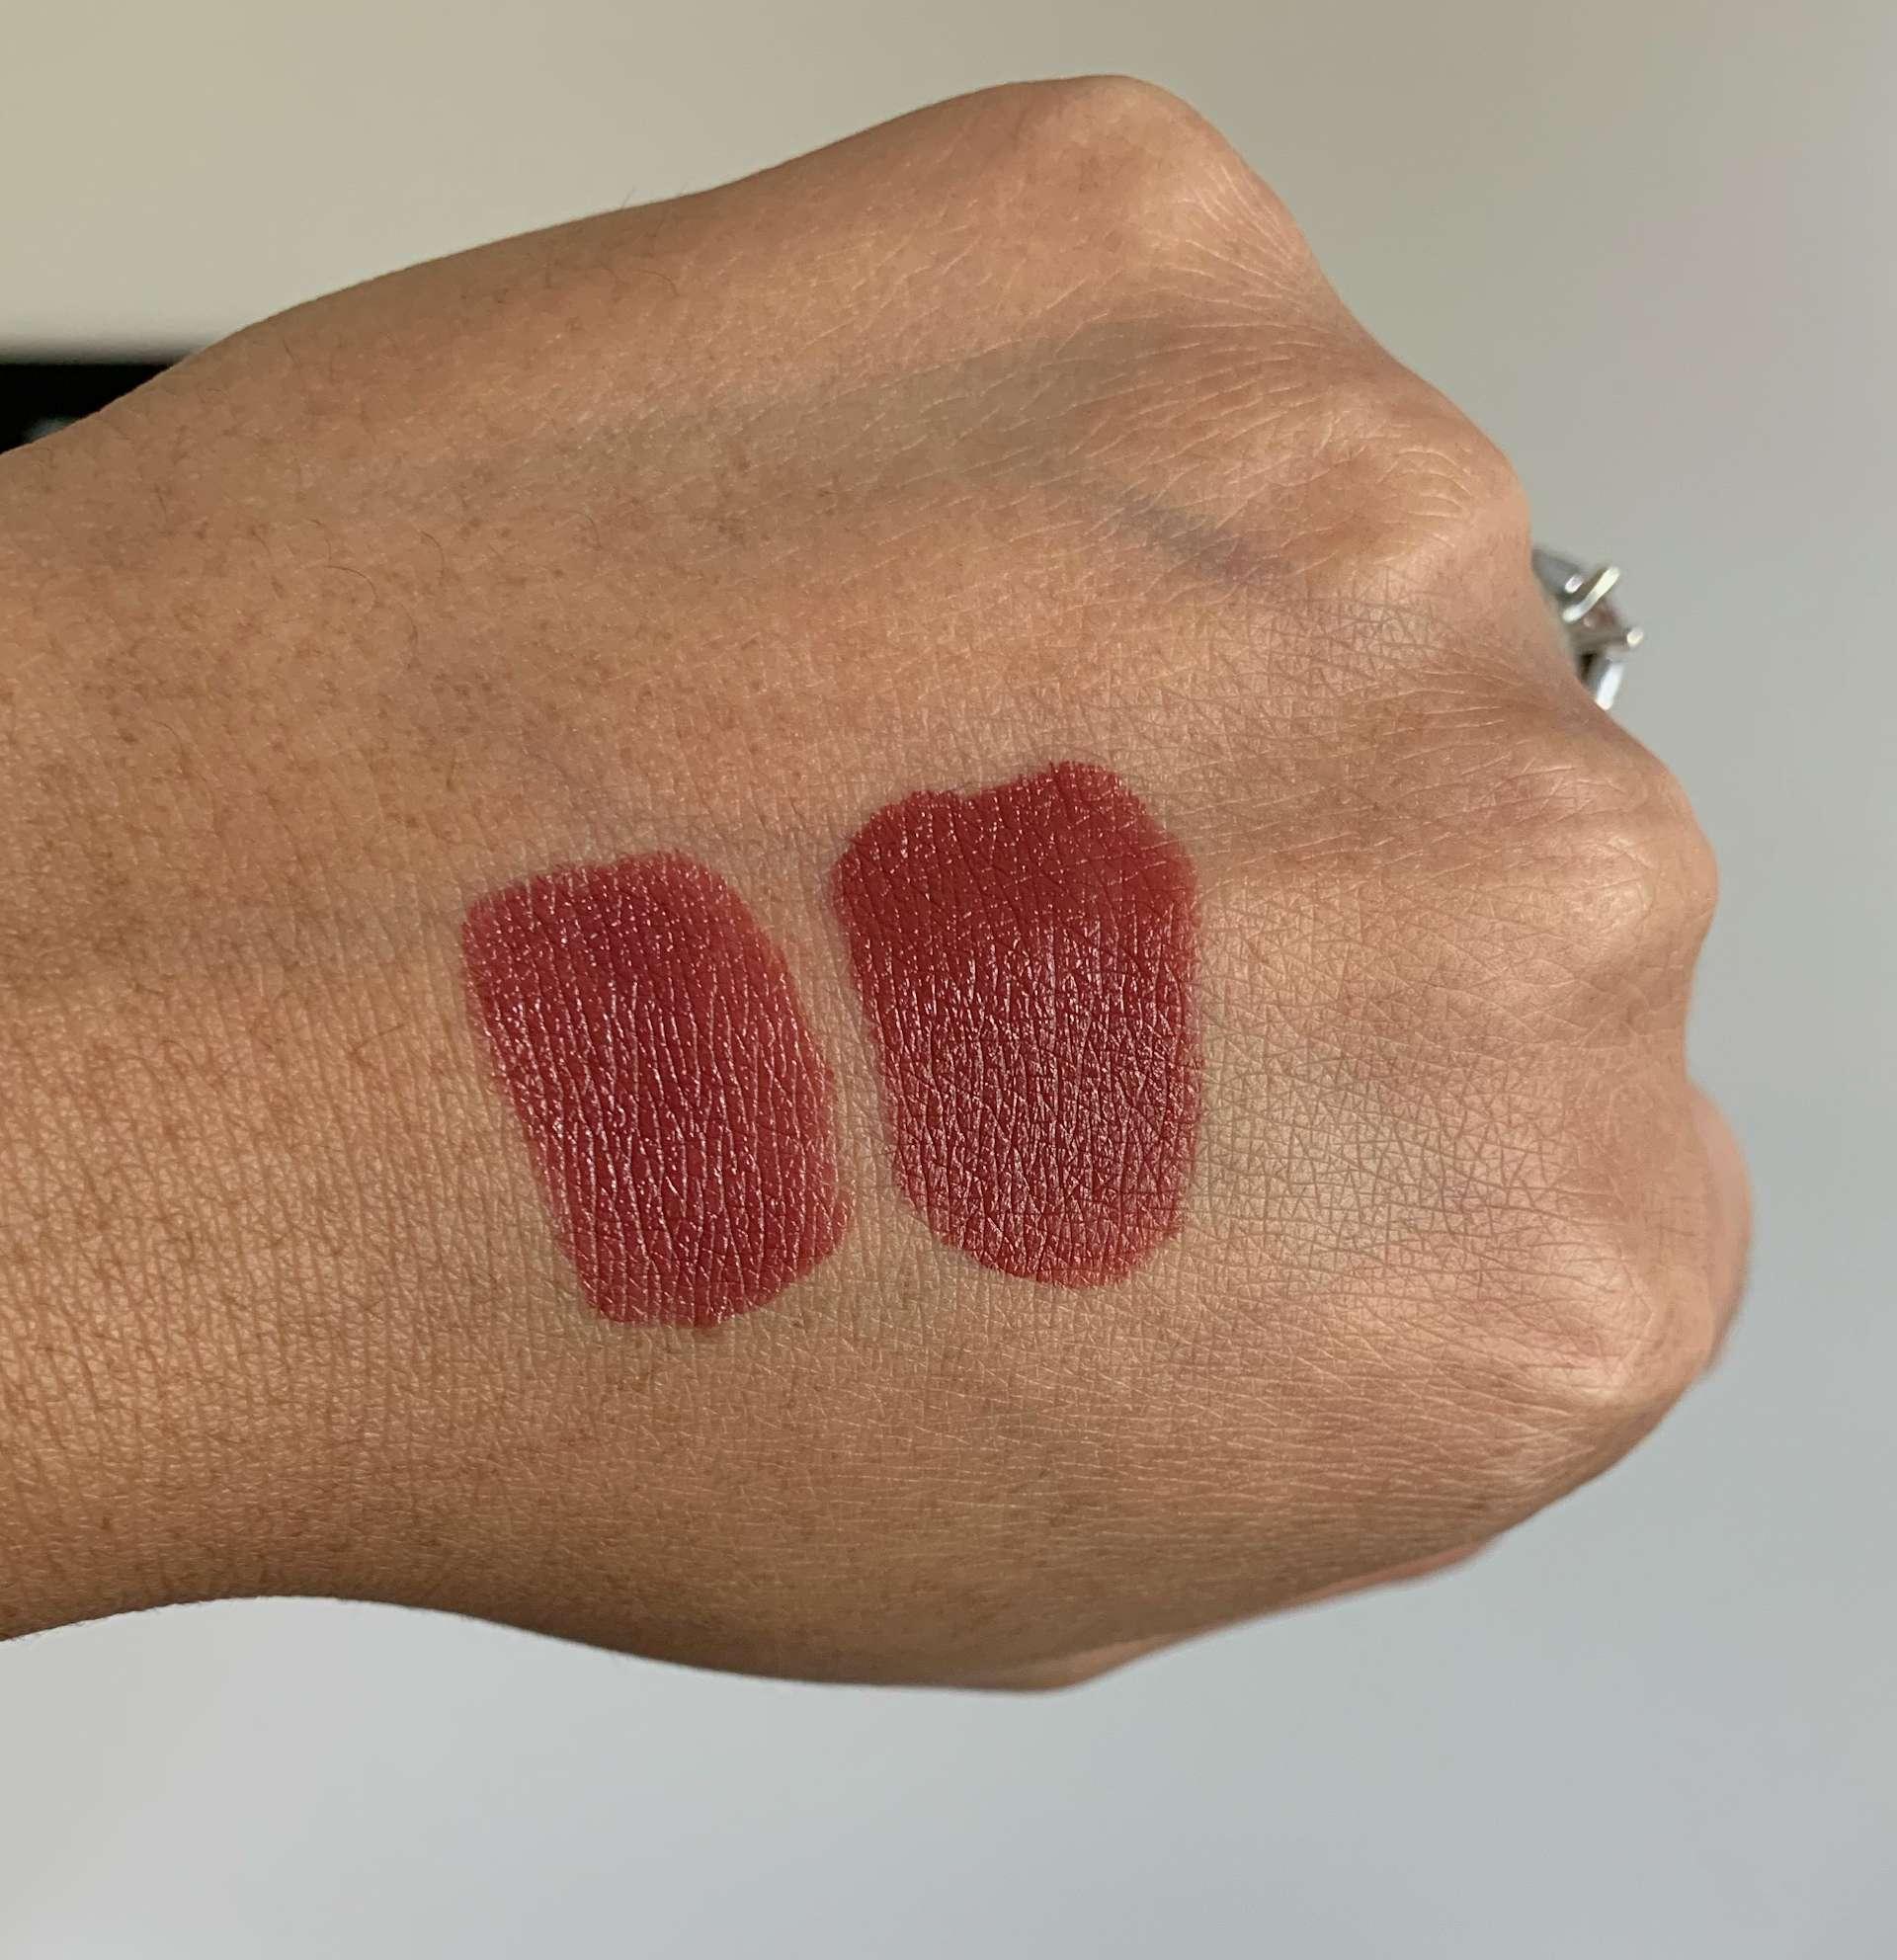 MAC Bated Breath Love Me lipstick vs Liquid Lip Colour Swatches on medium dark skin